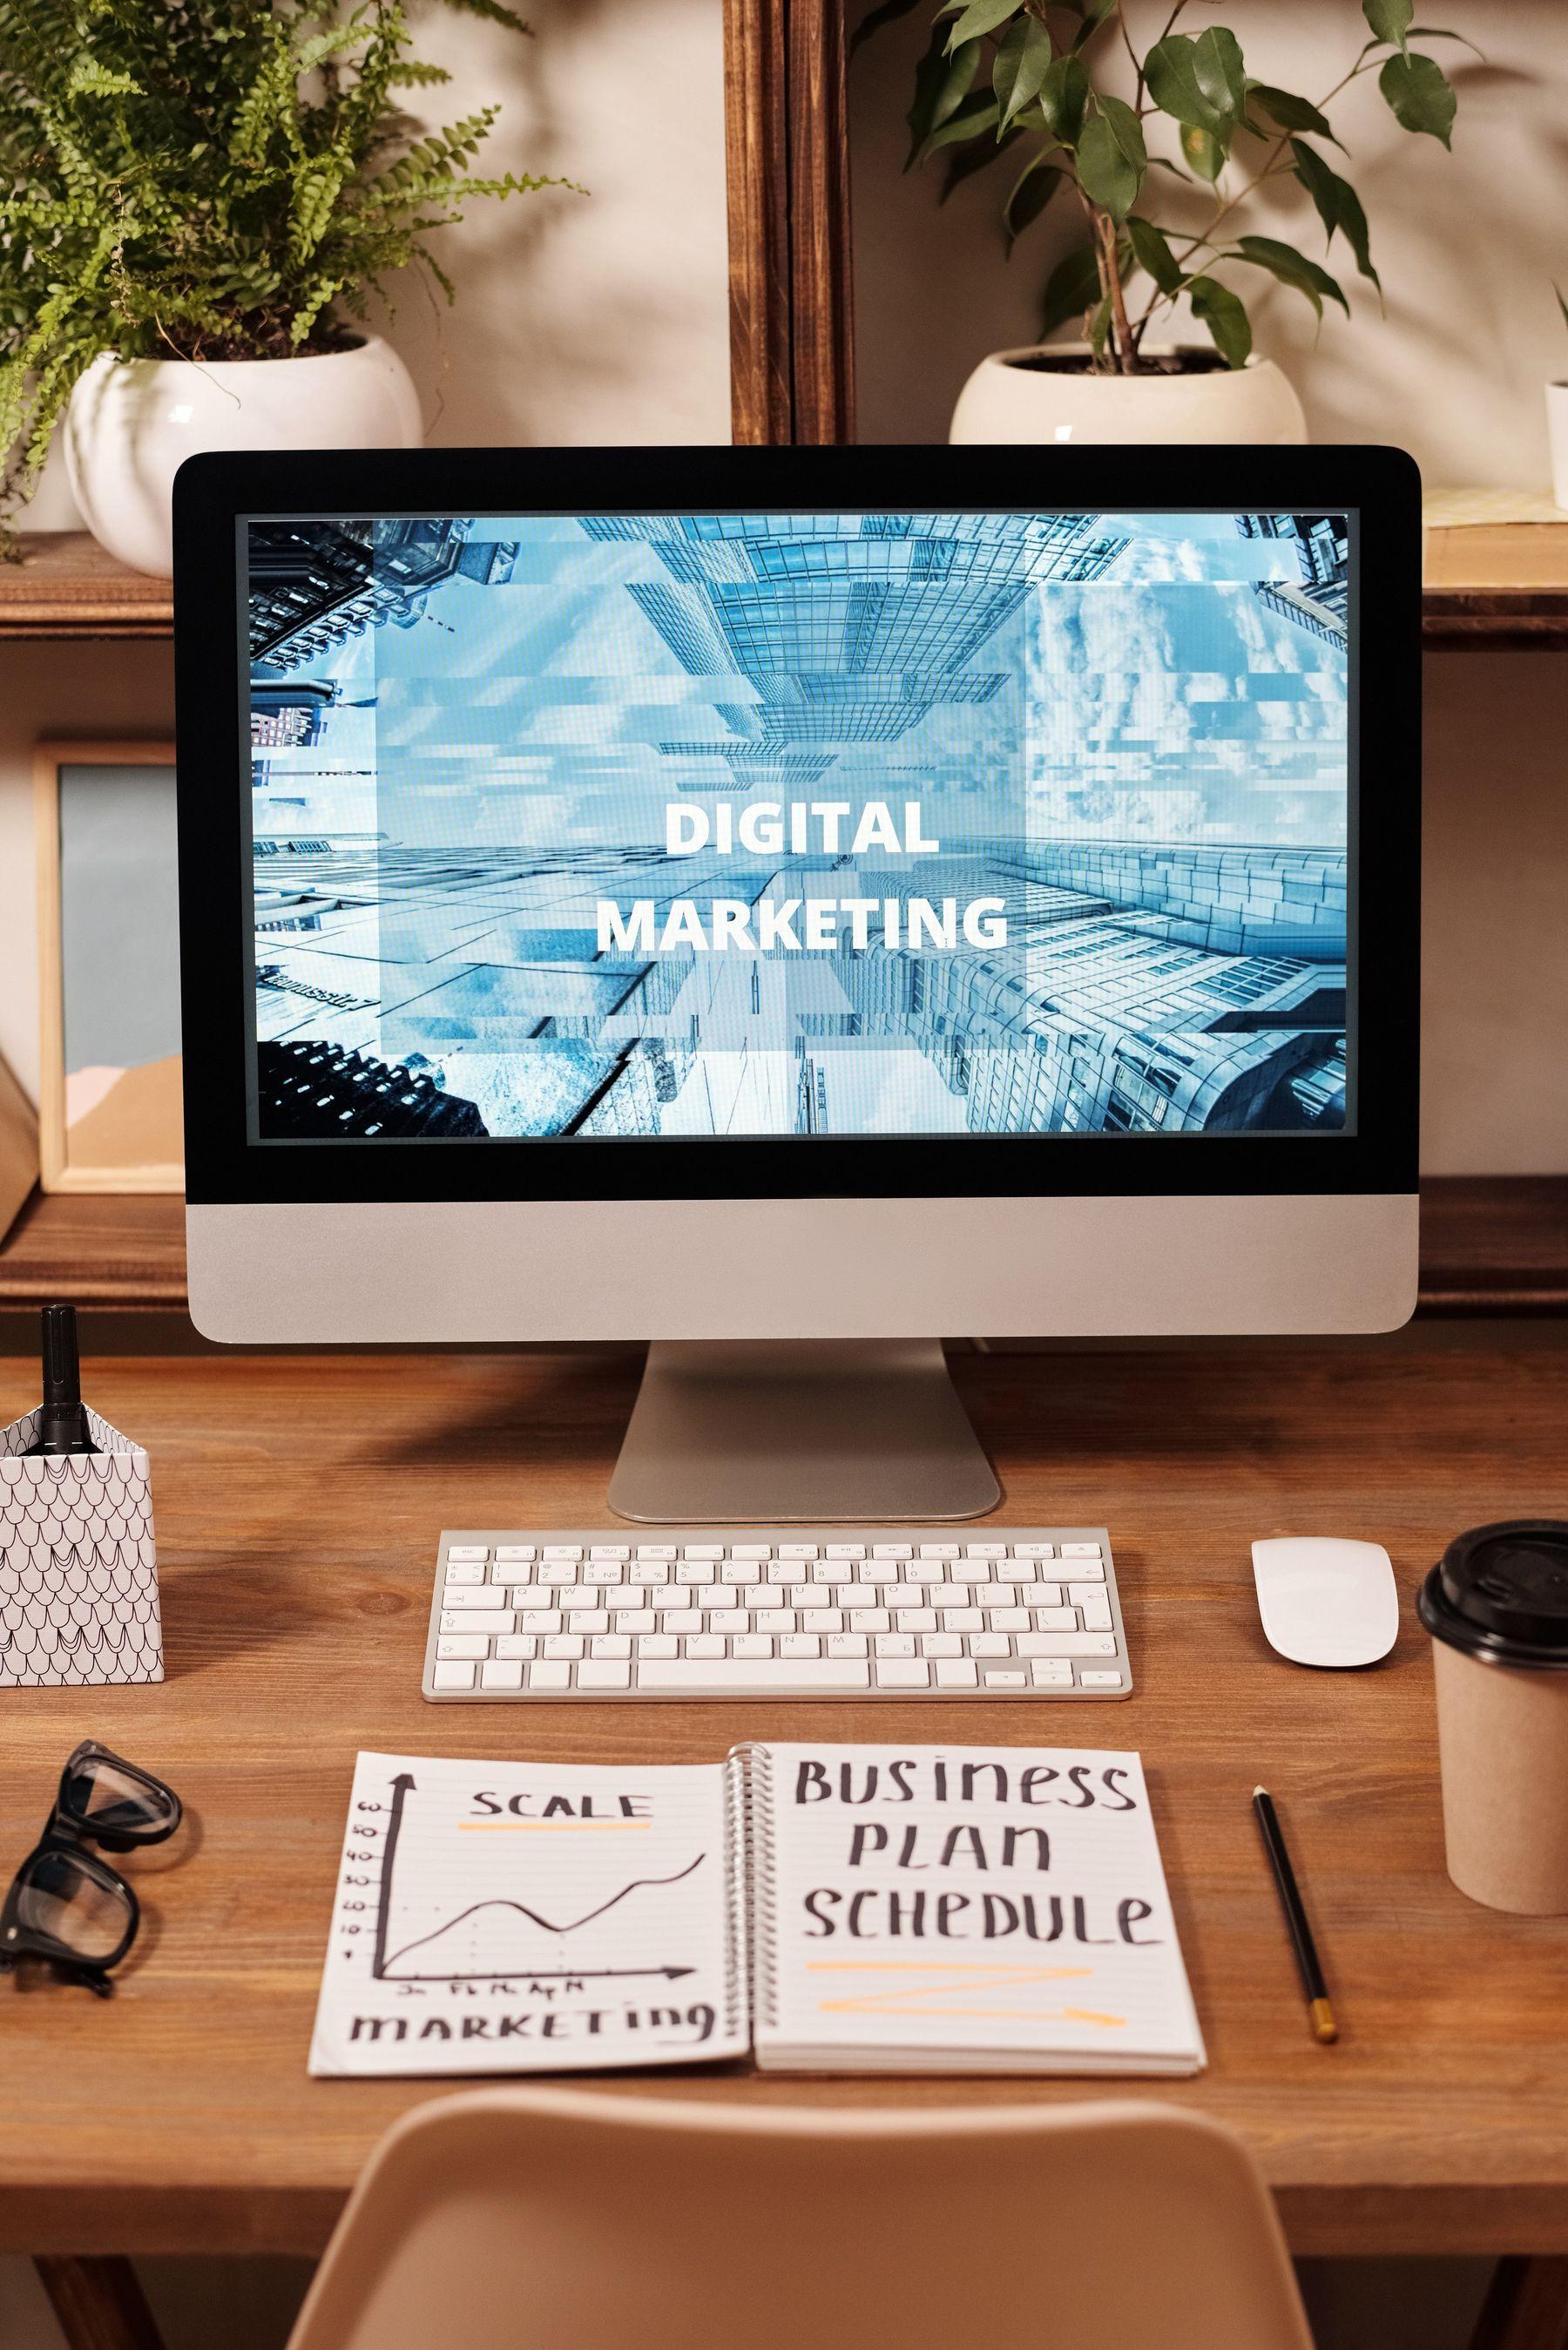 digital marketing on a laptop